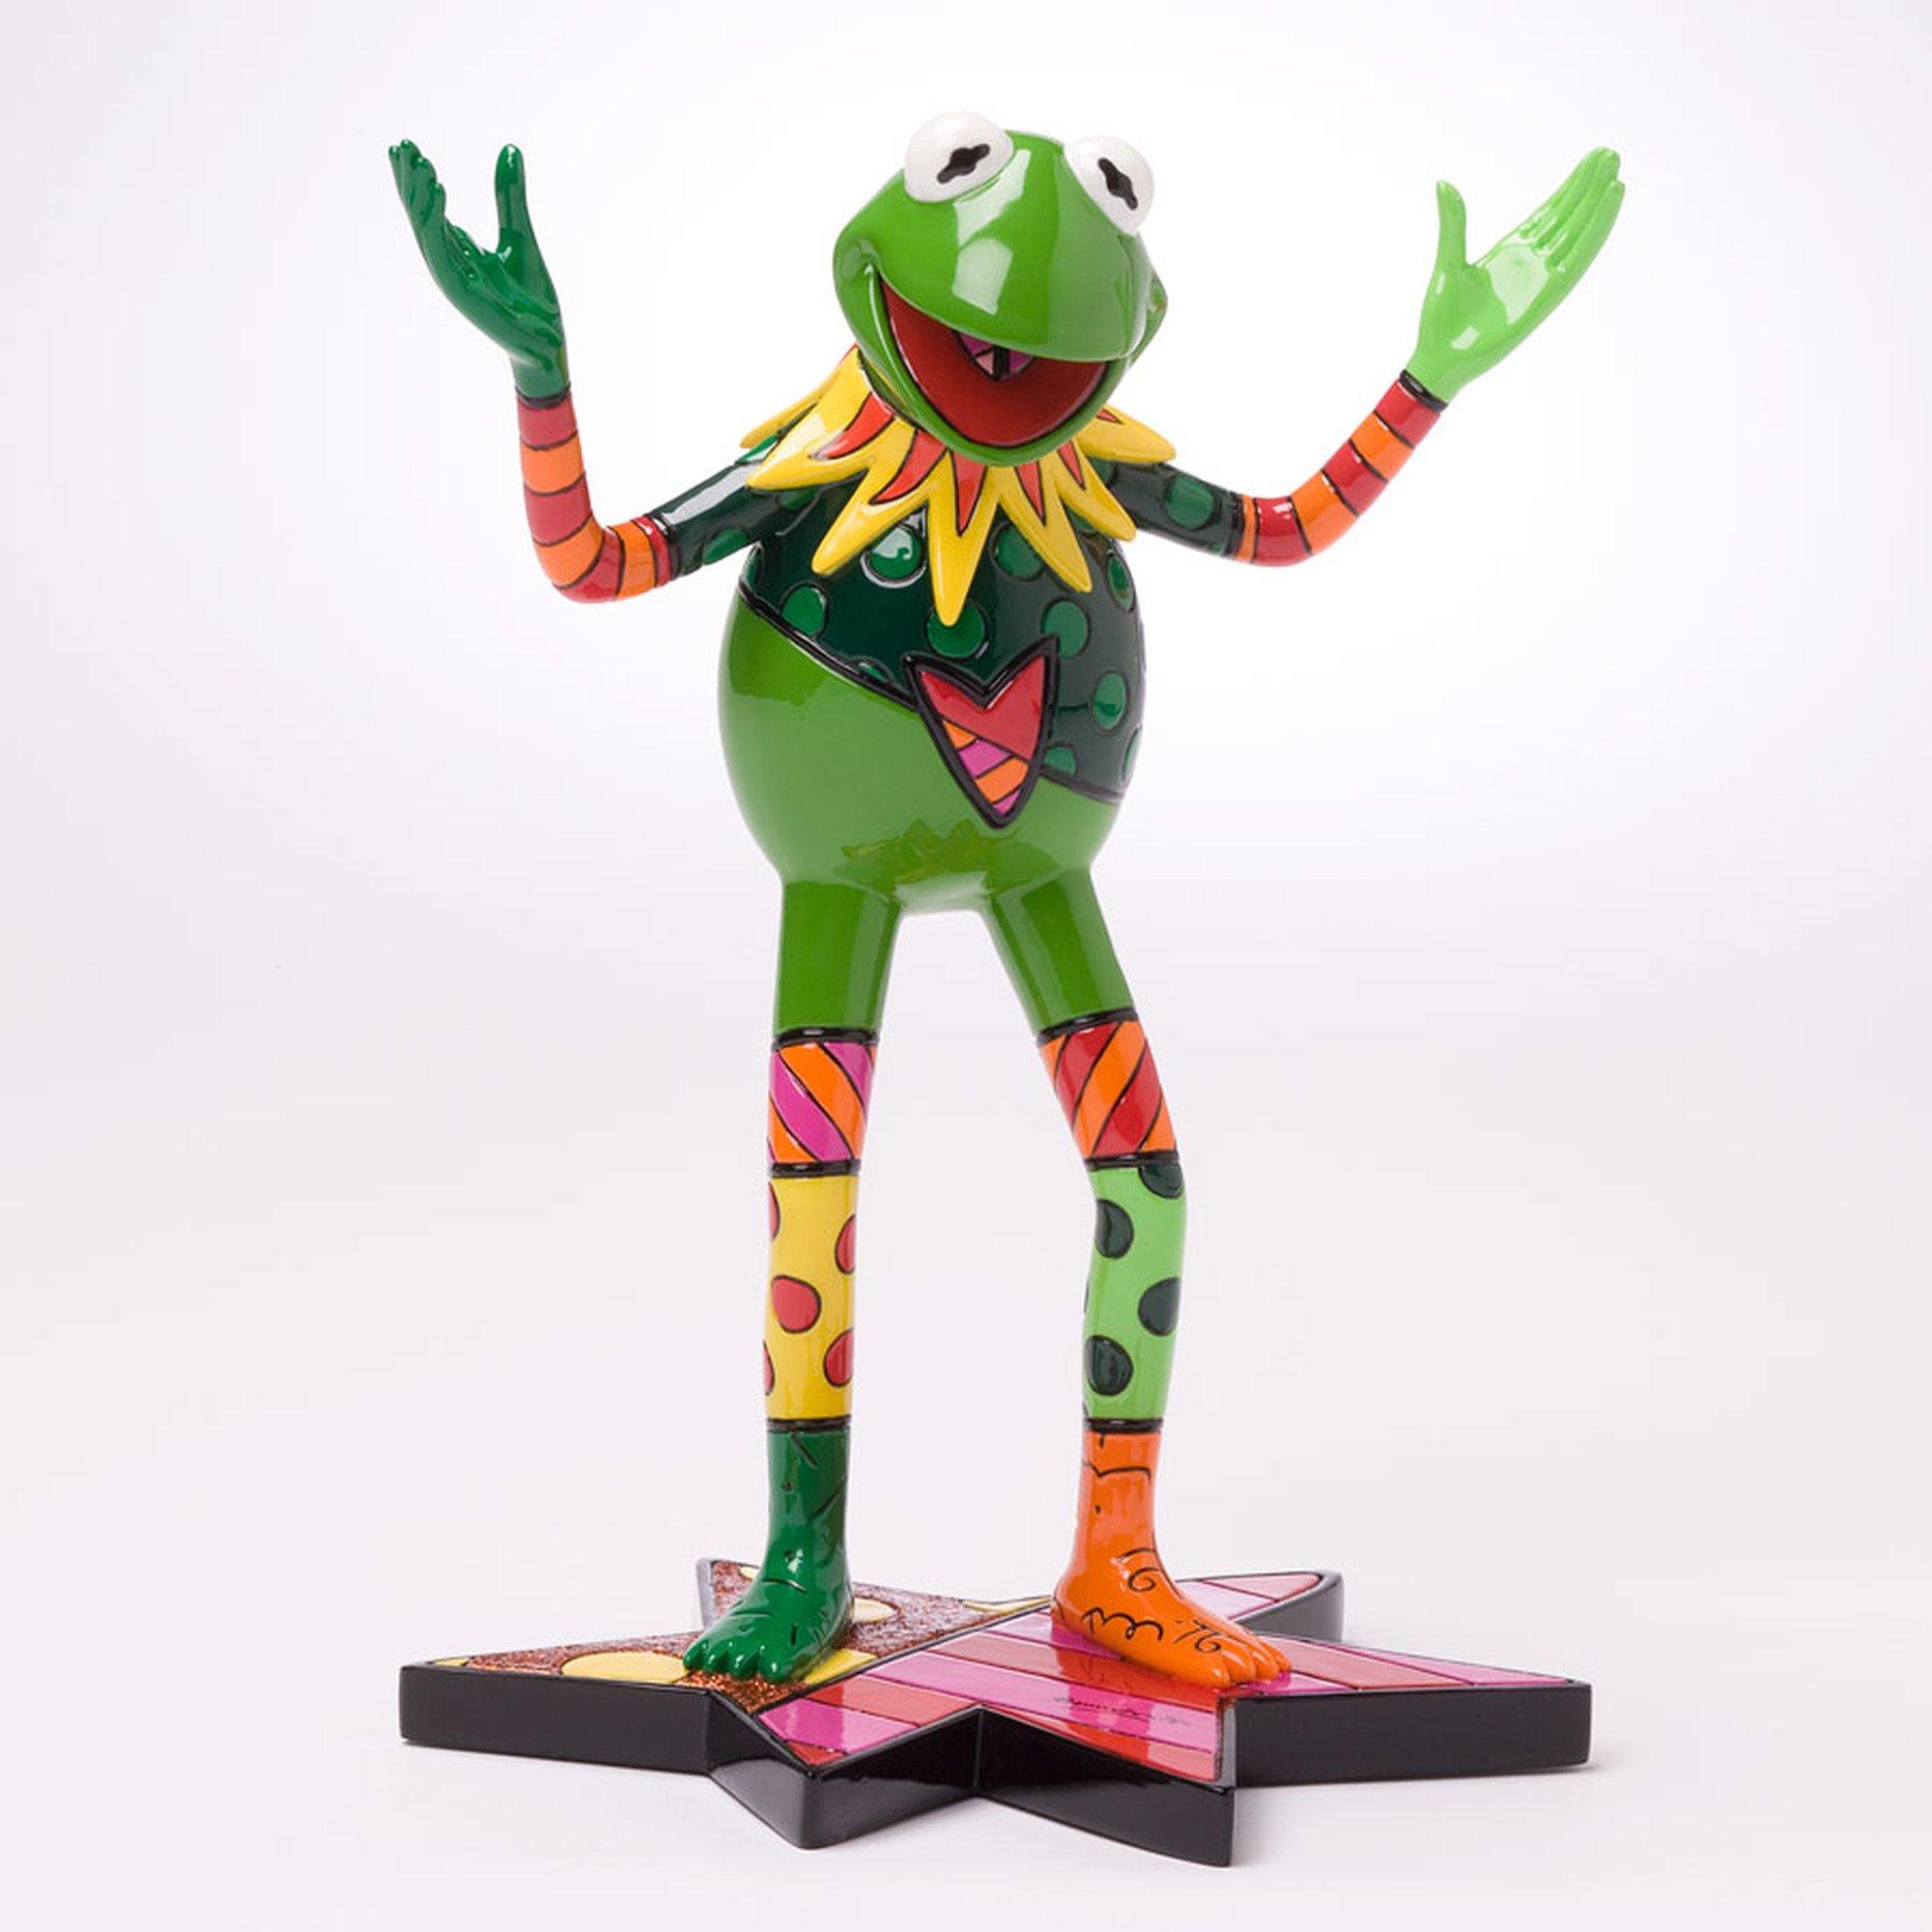 Enesco Disney by Britto Kermit The Frog Figurine, 8-3/4-Inch